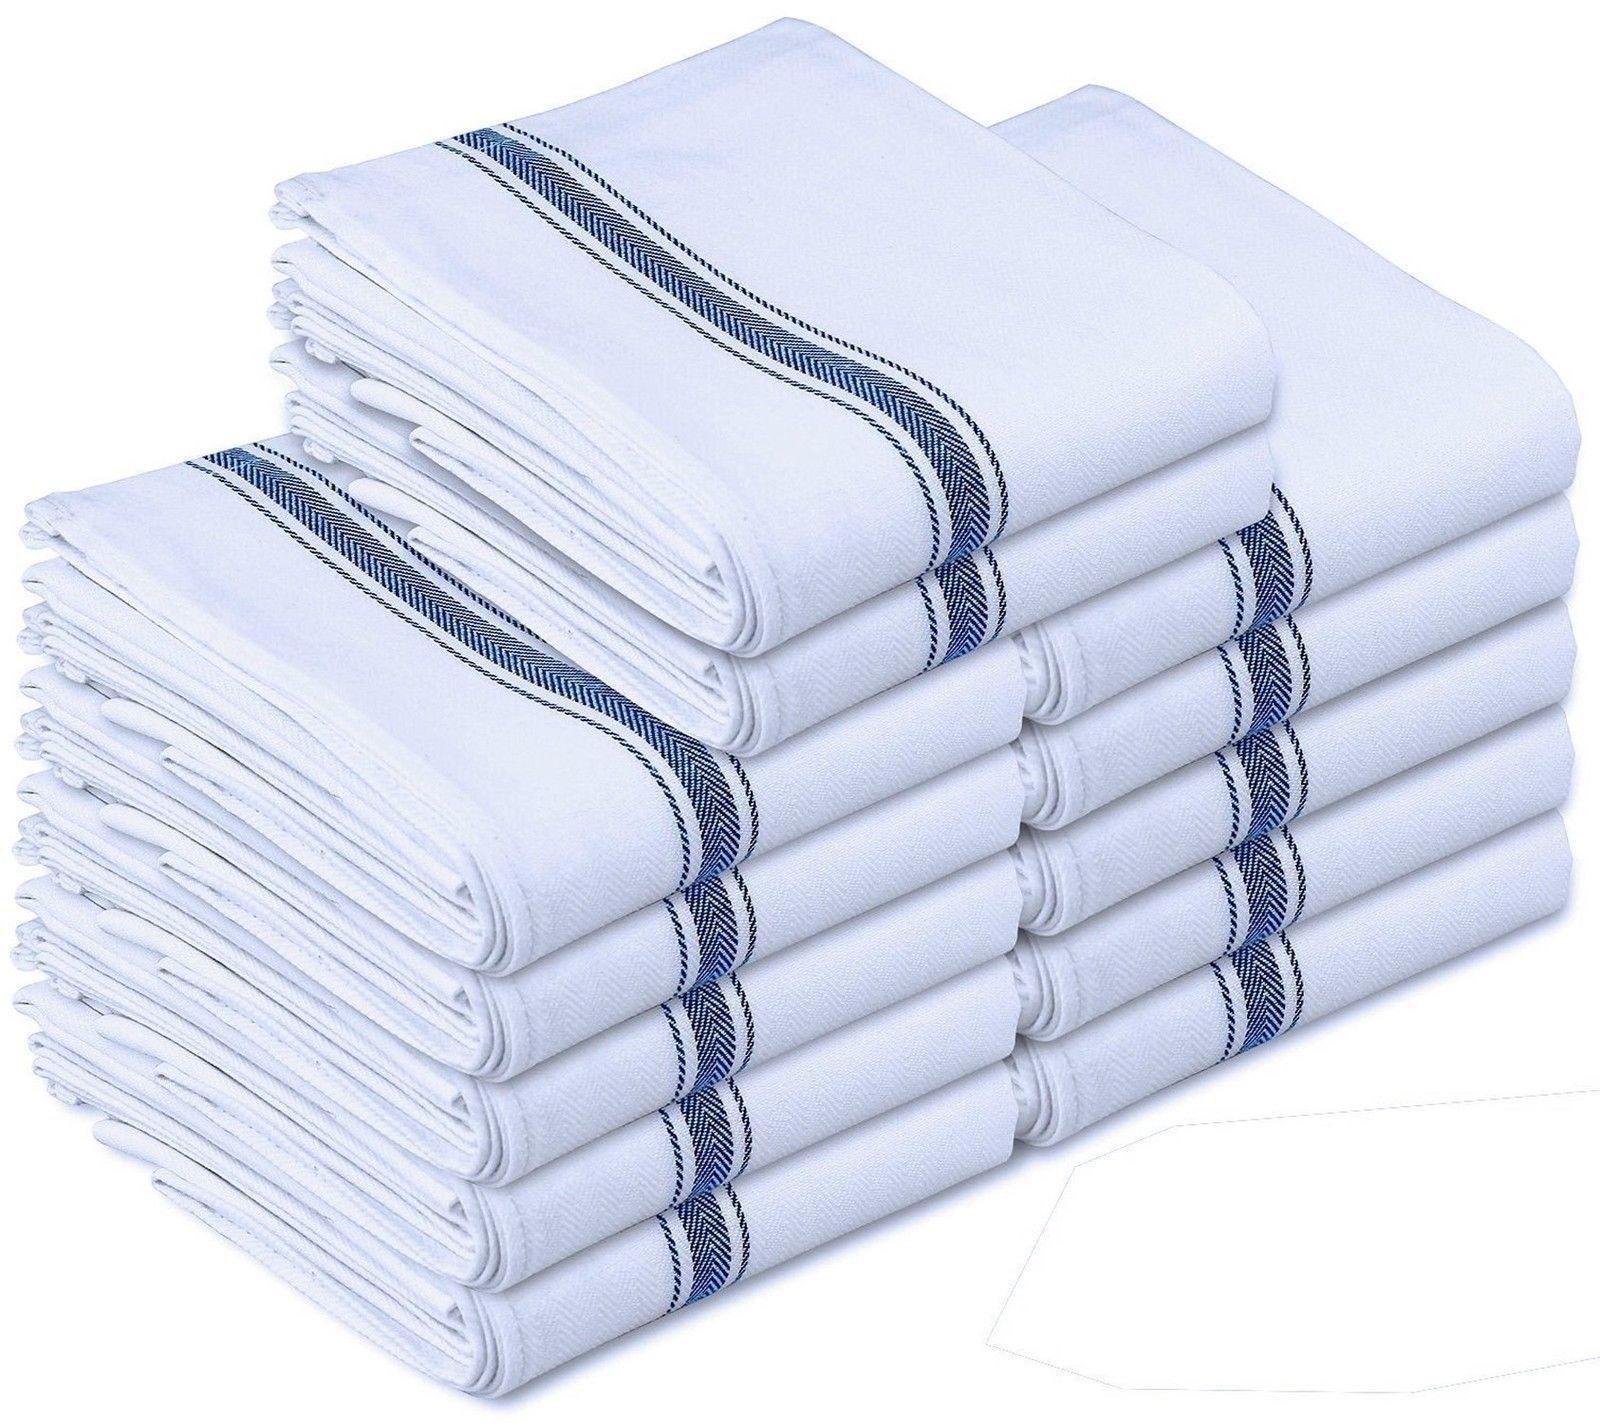 Kitchen Restaurant Hotel Dish Cloth Tea Towels 12 Pack White